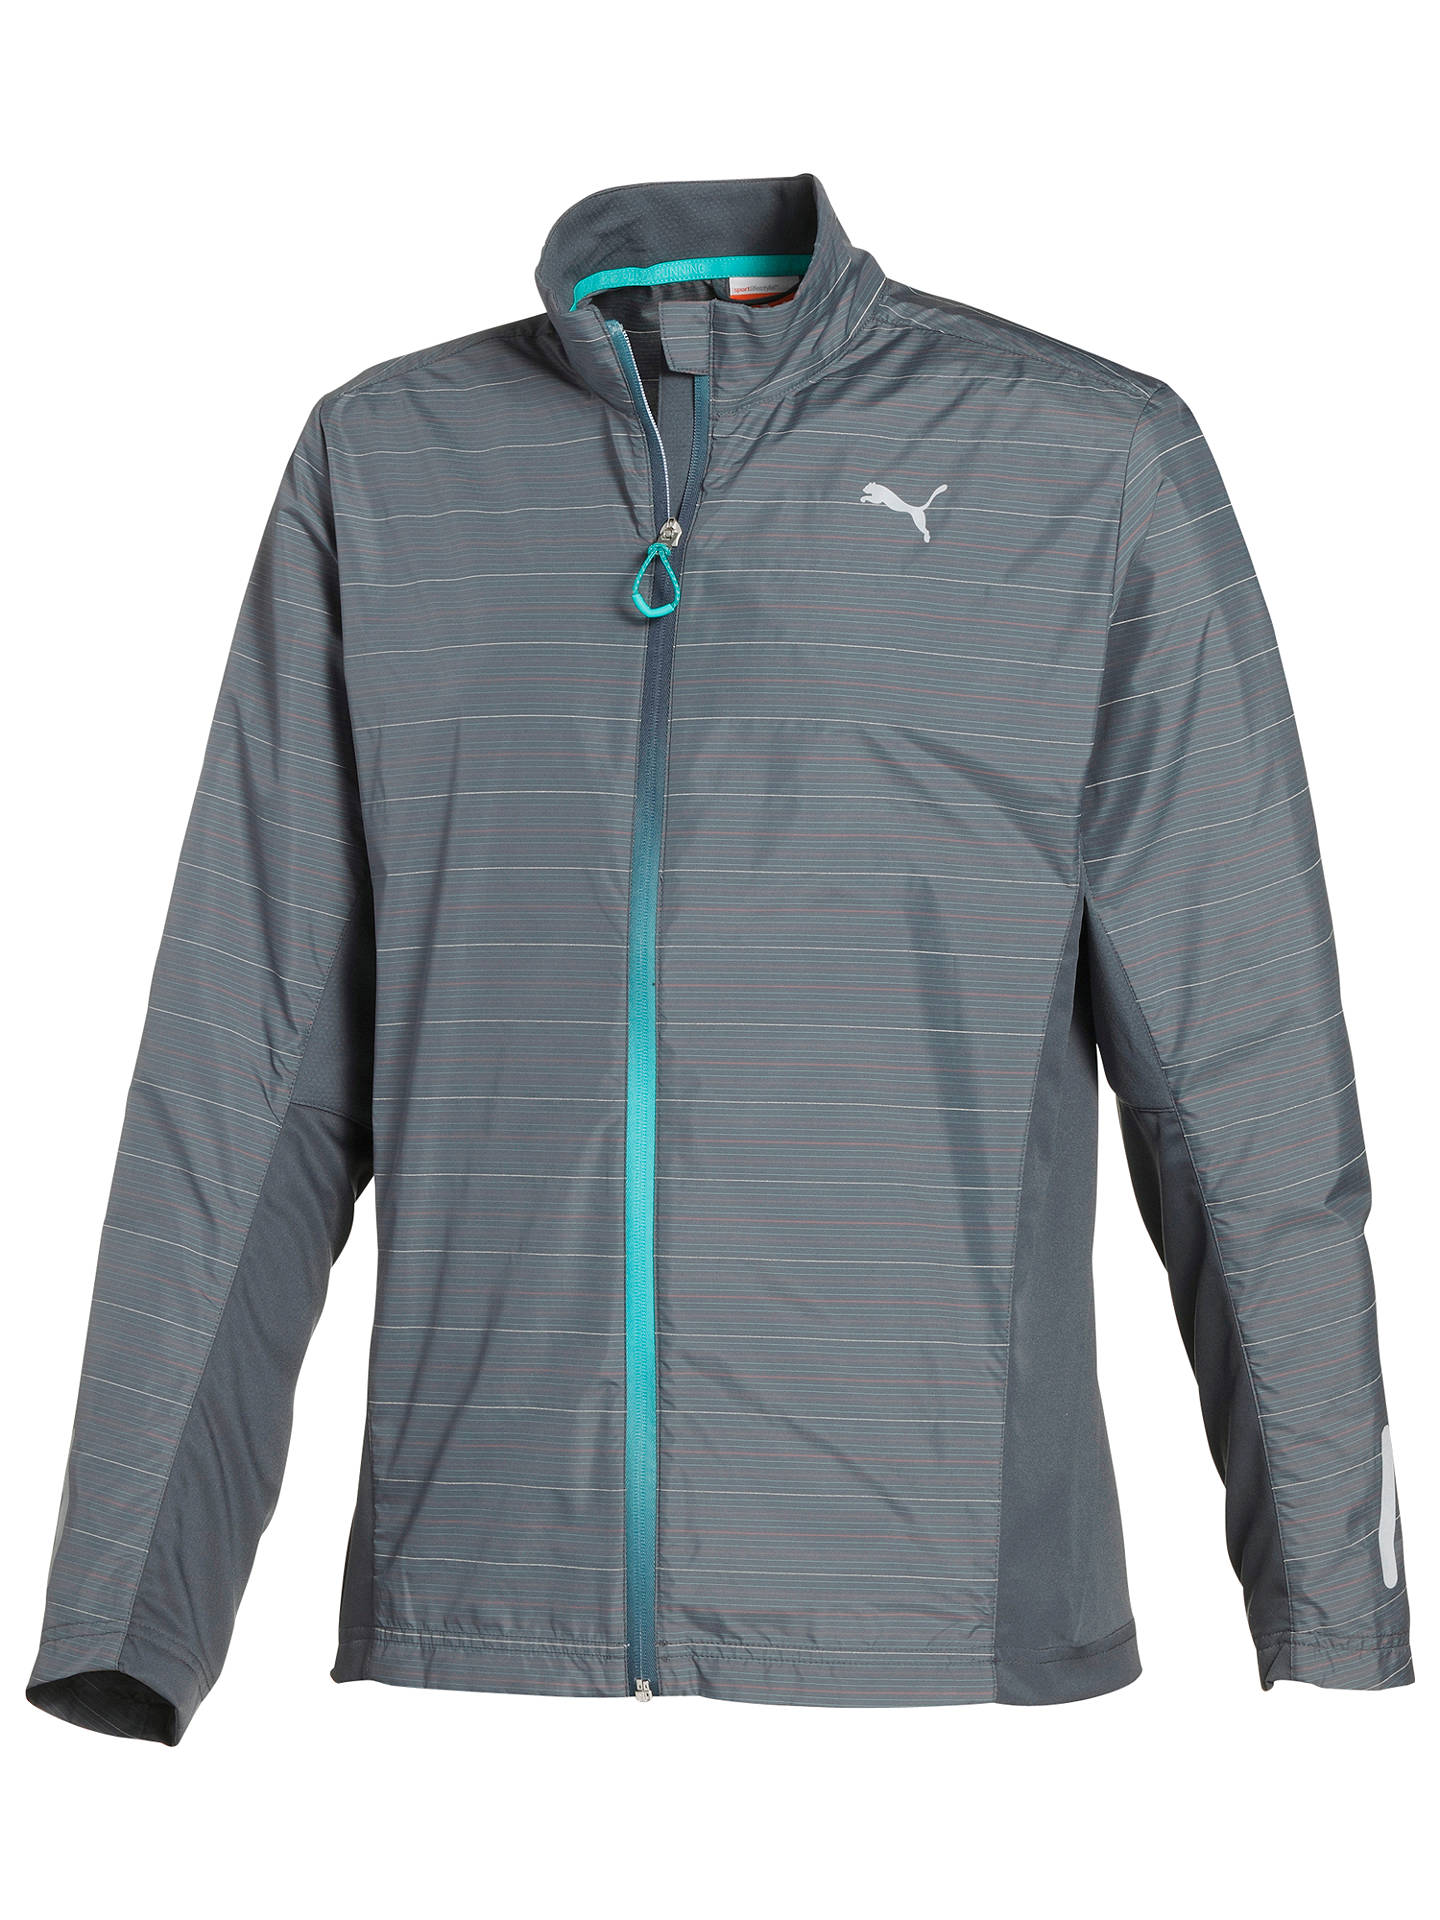 Puma NightCat Running Jacket at John Lewis   Partners 3fd9d9ab9